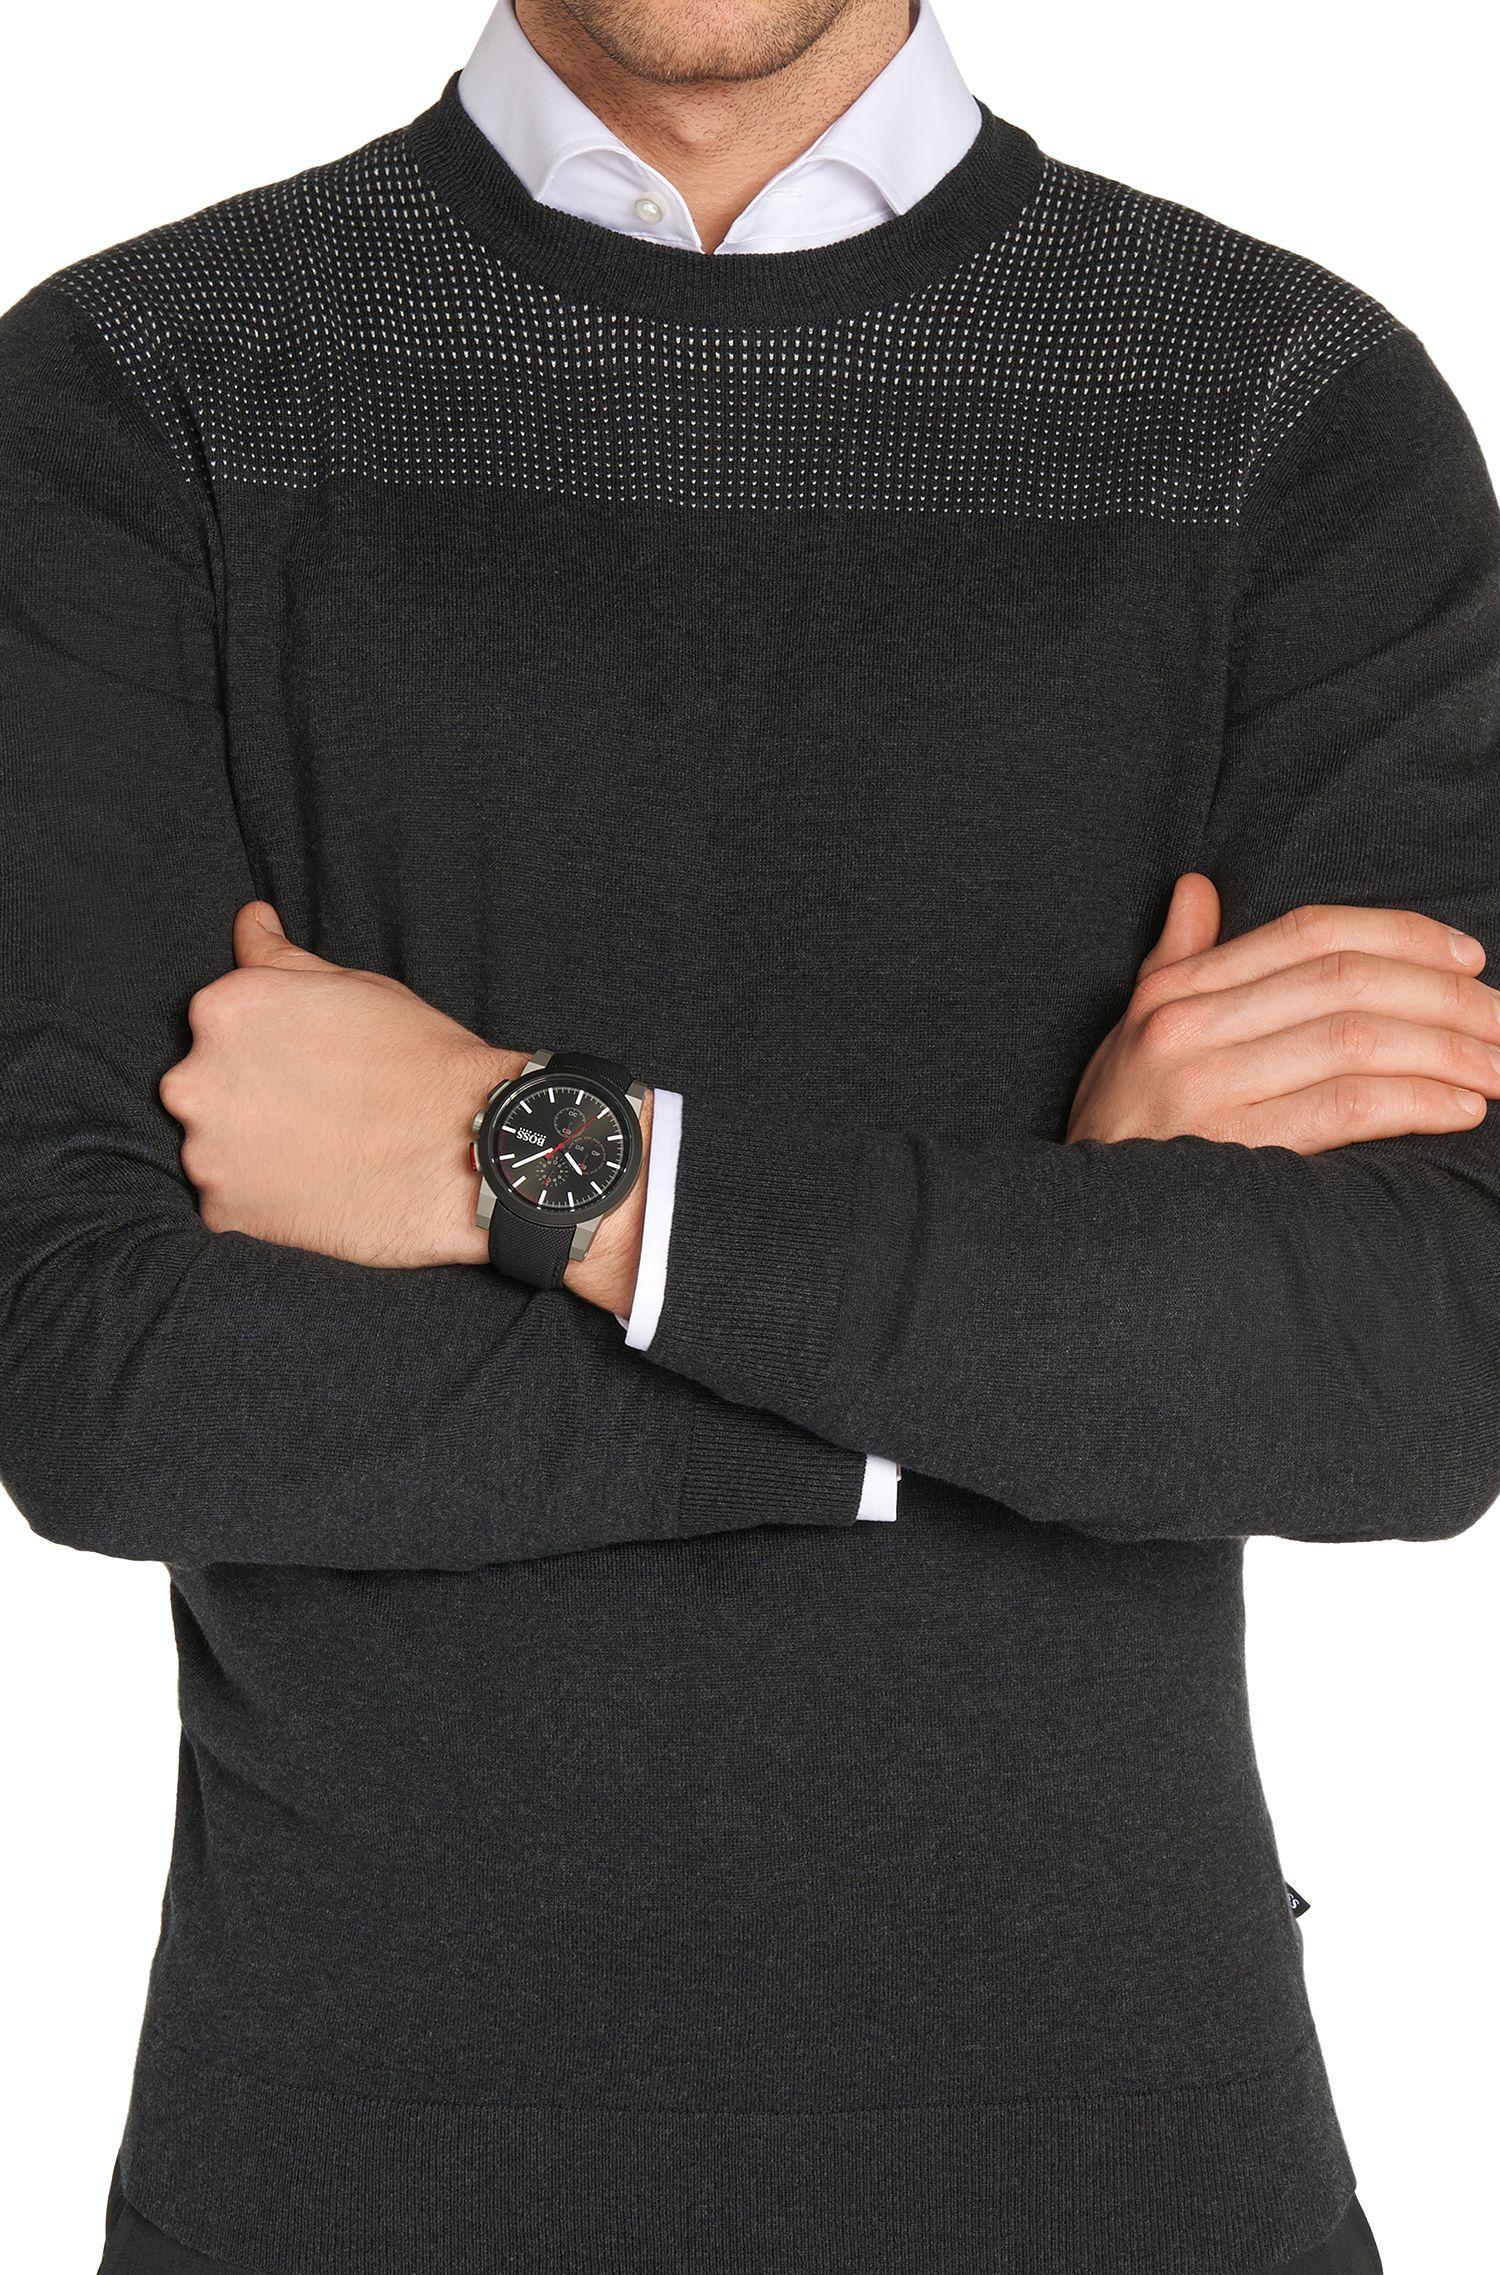 '1512979' | Chronograph Black Nylon Canvas Strap Watch